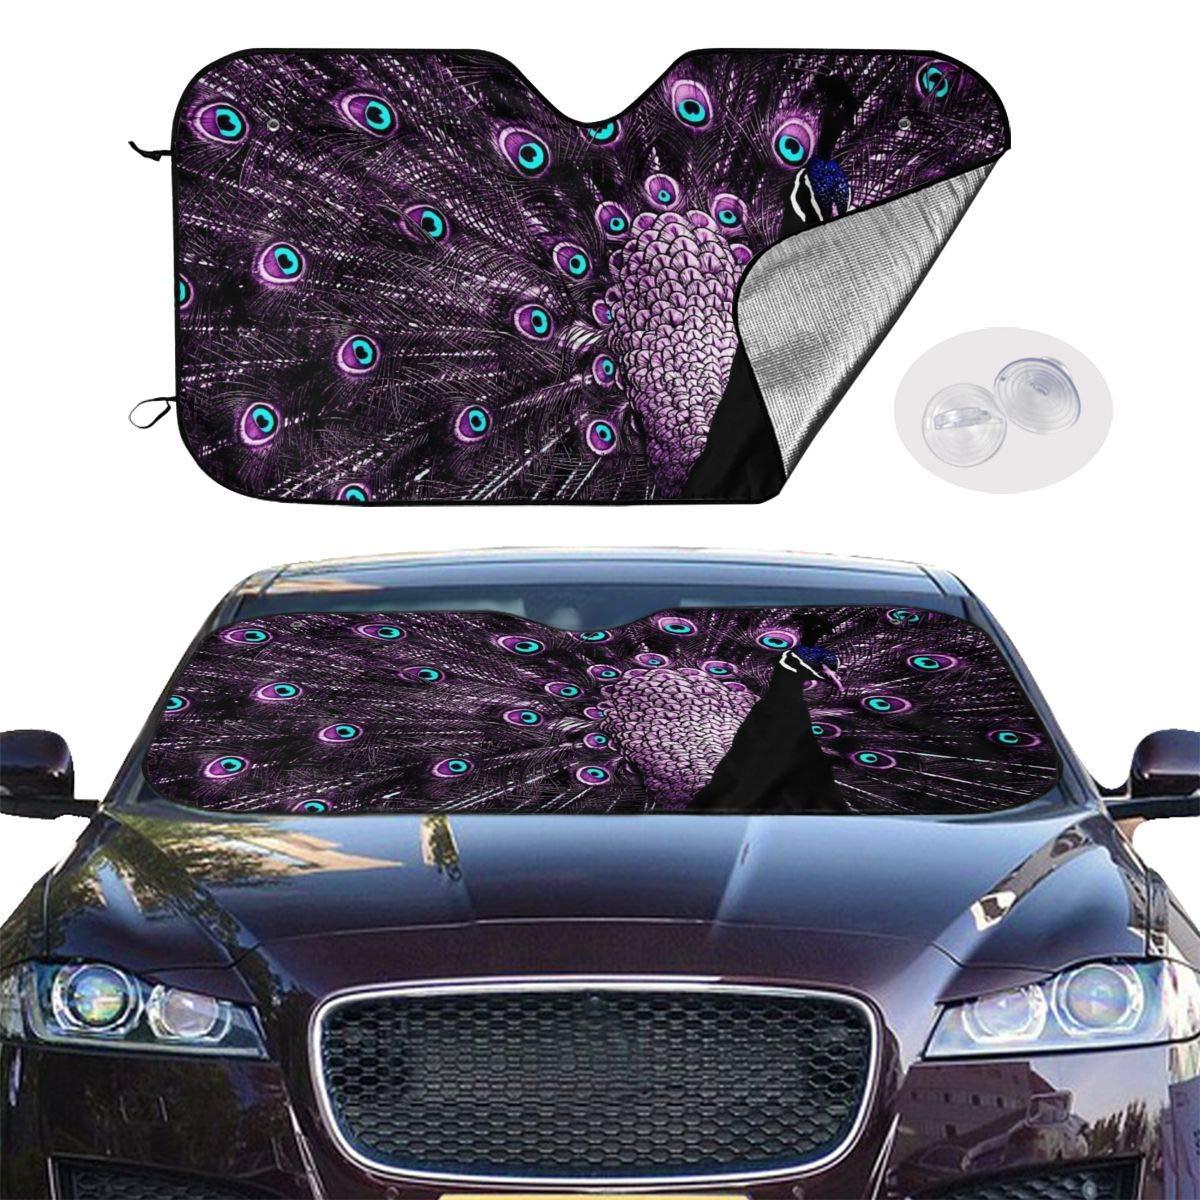 Wonderful Purple Peacock Car Sunshade Window Windscreen Cover,Automotive Window Protector Sunshade Uv Sun and Heat Reflector for Car Truck SUV,Keep Your Vehicle Cool and Damage Free